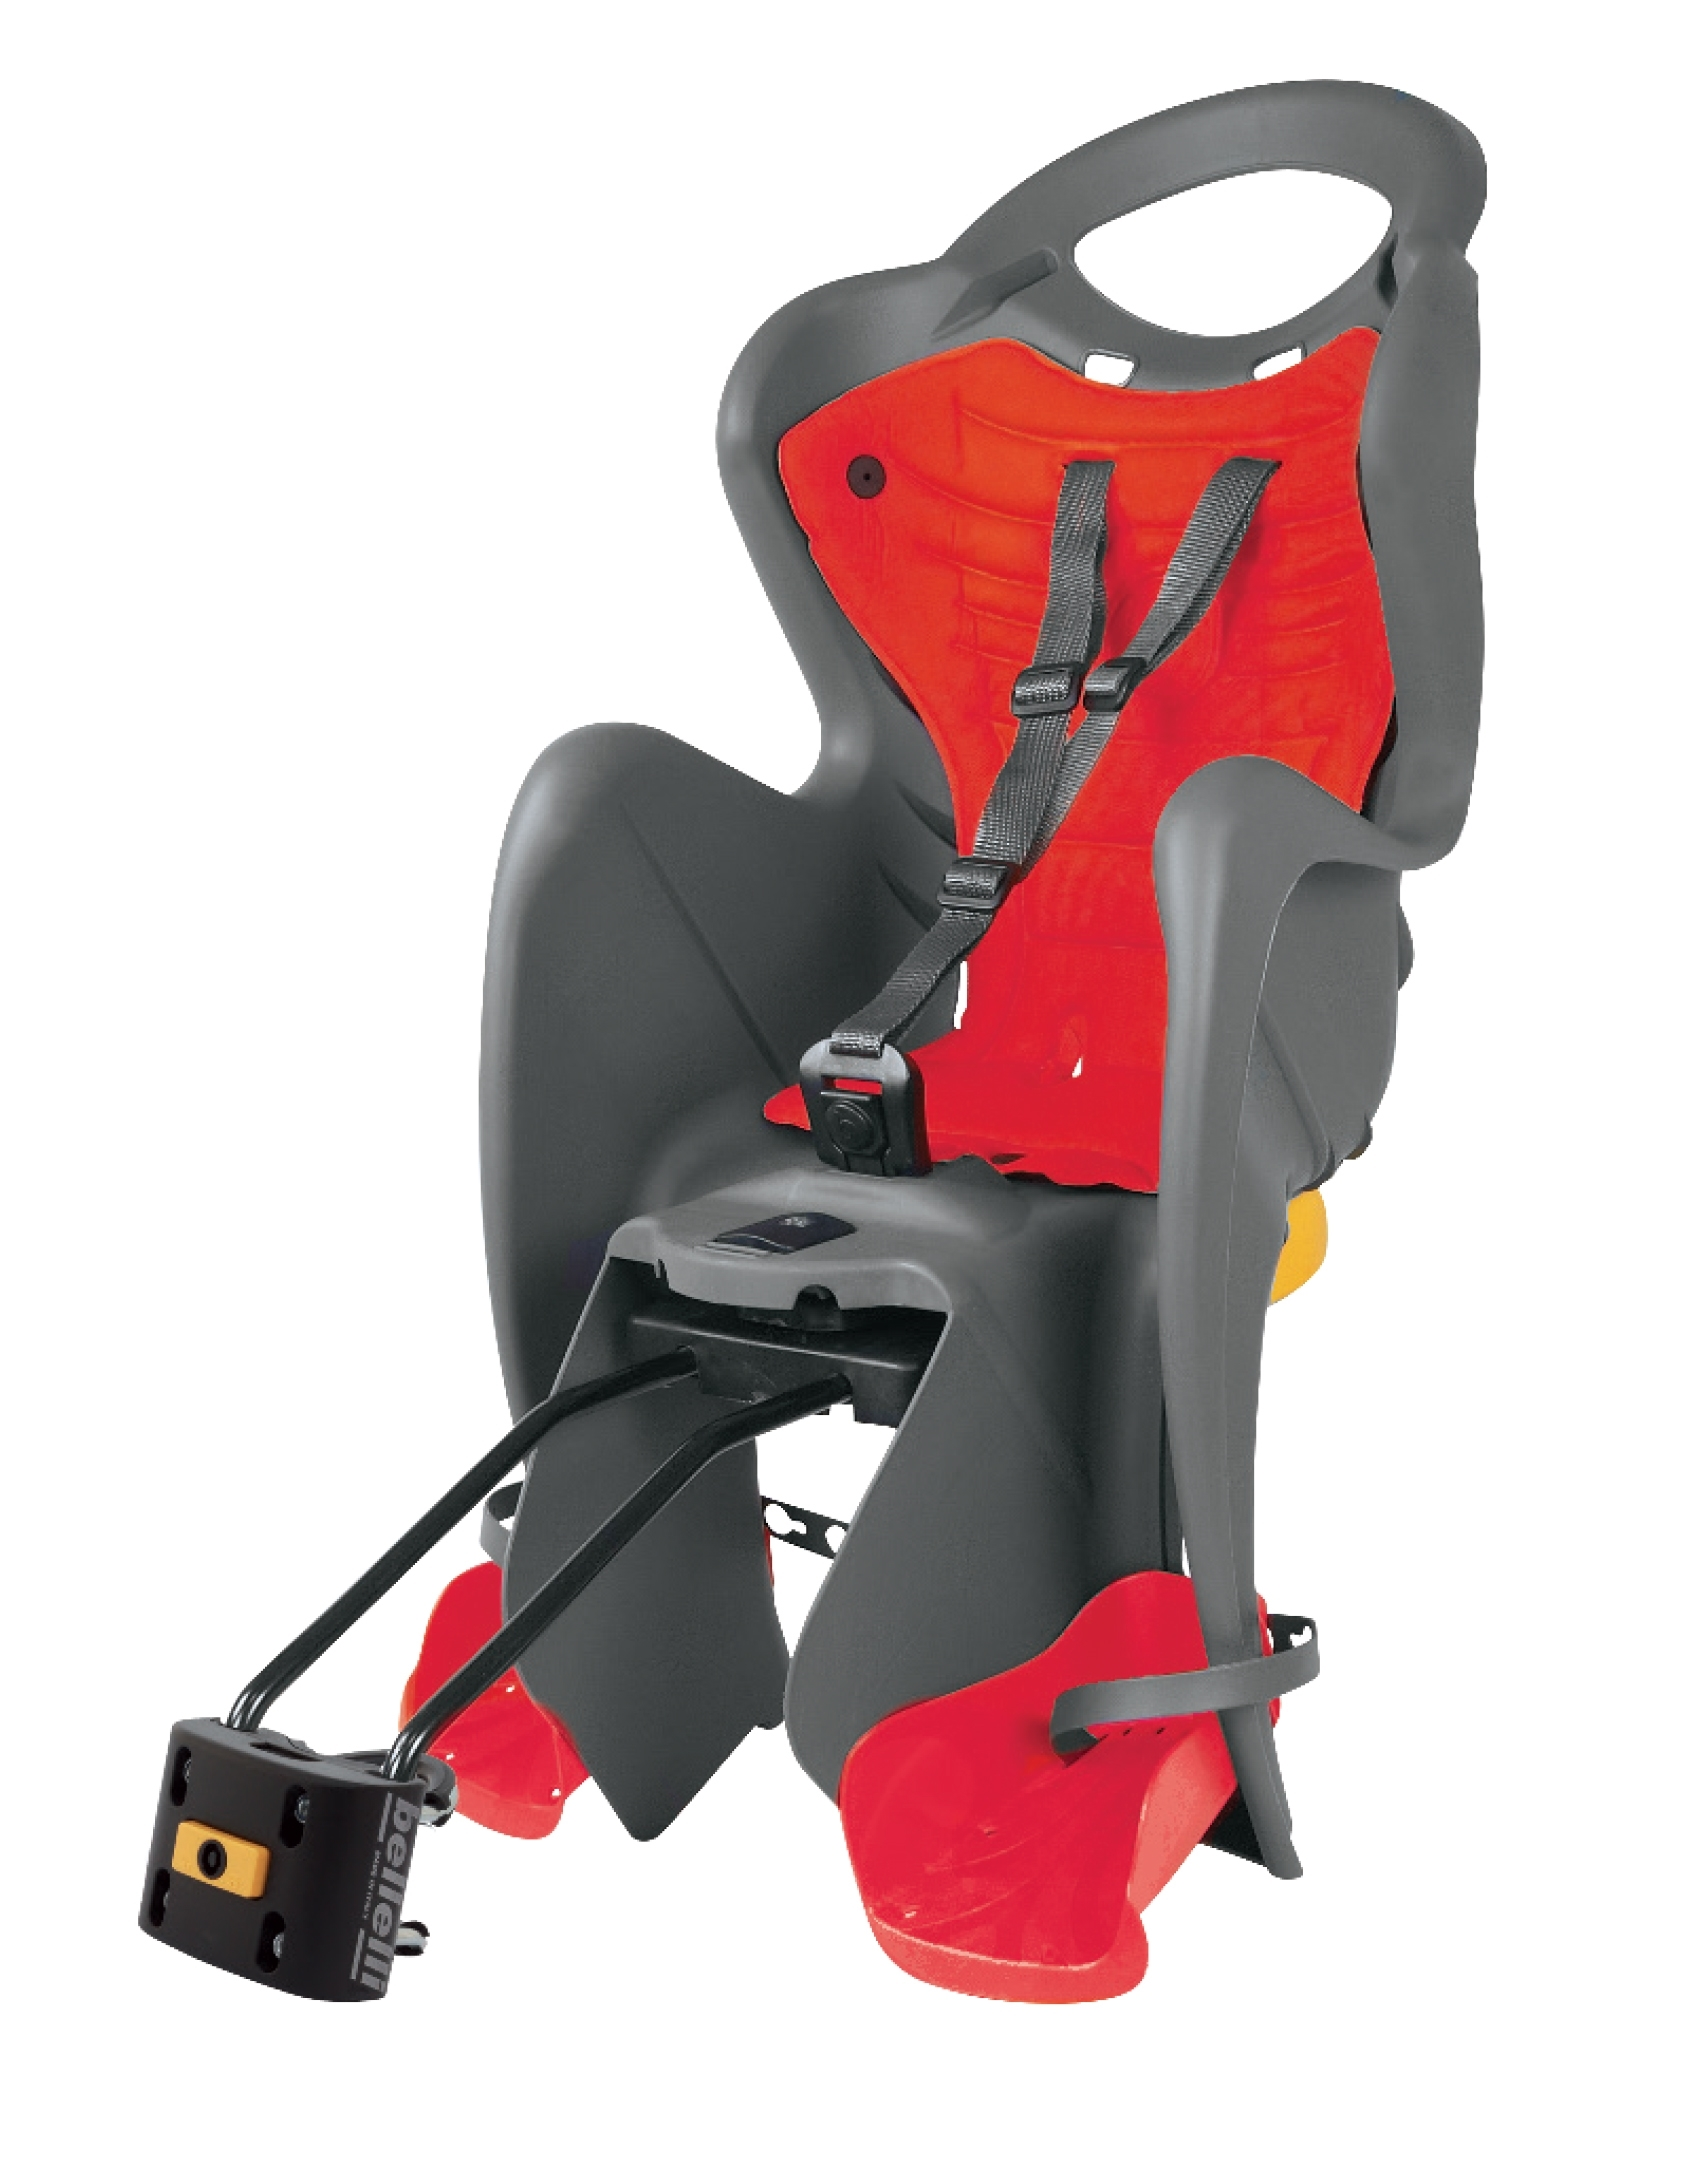 BELLELLI sedačka MR FOX STANDARD B-FIX zadní šedá/červený